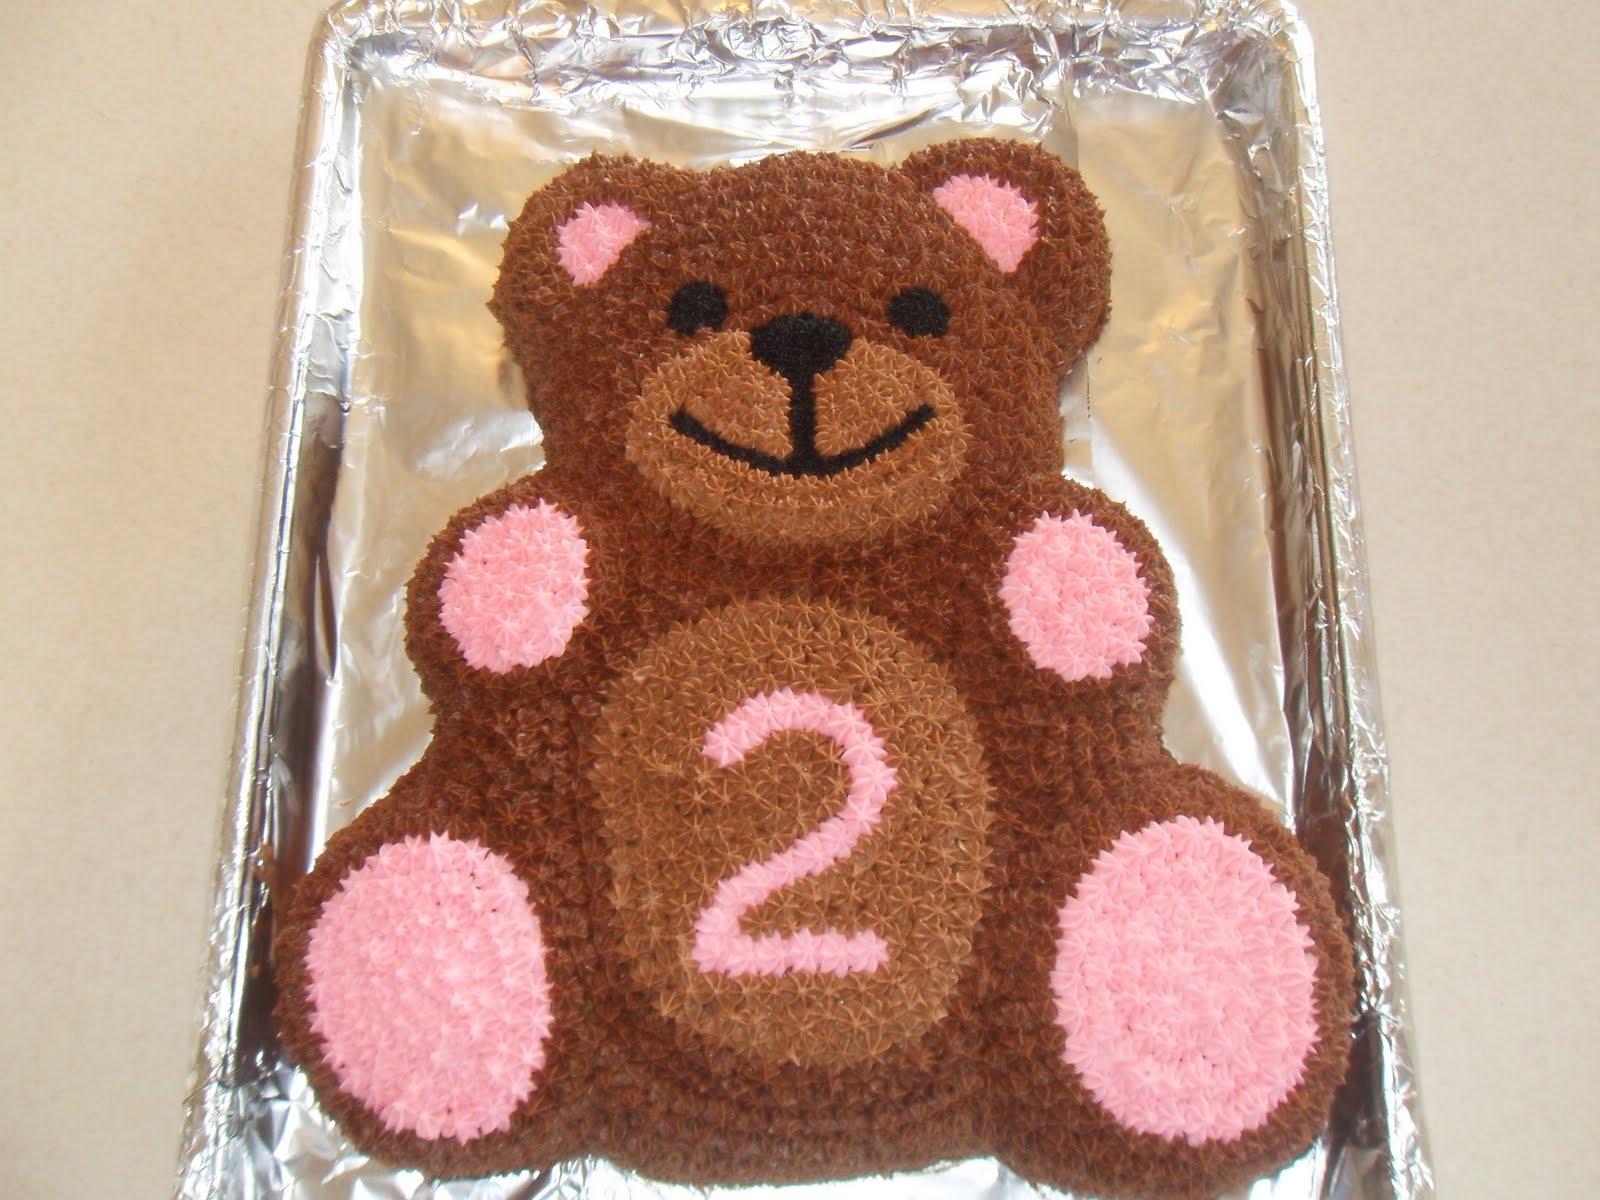 Simple Joy Crafting Teddy Bear Birthday Cake